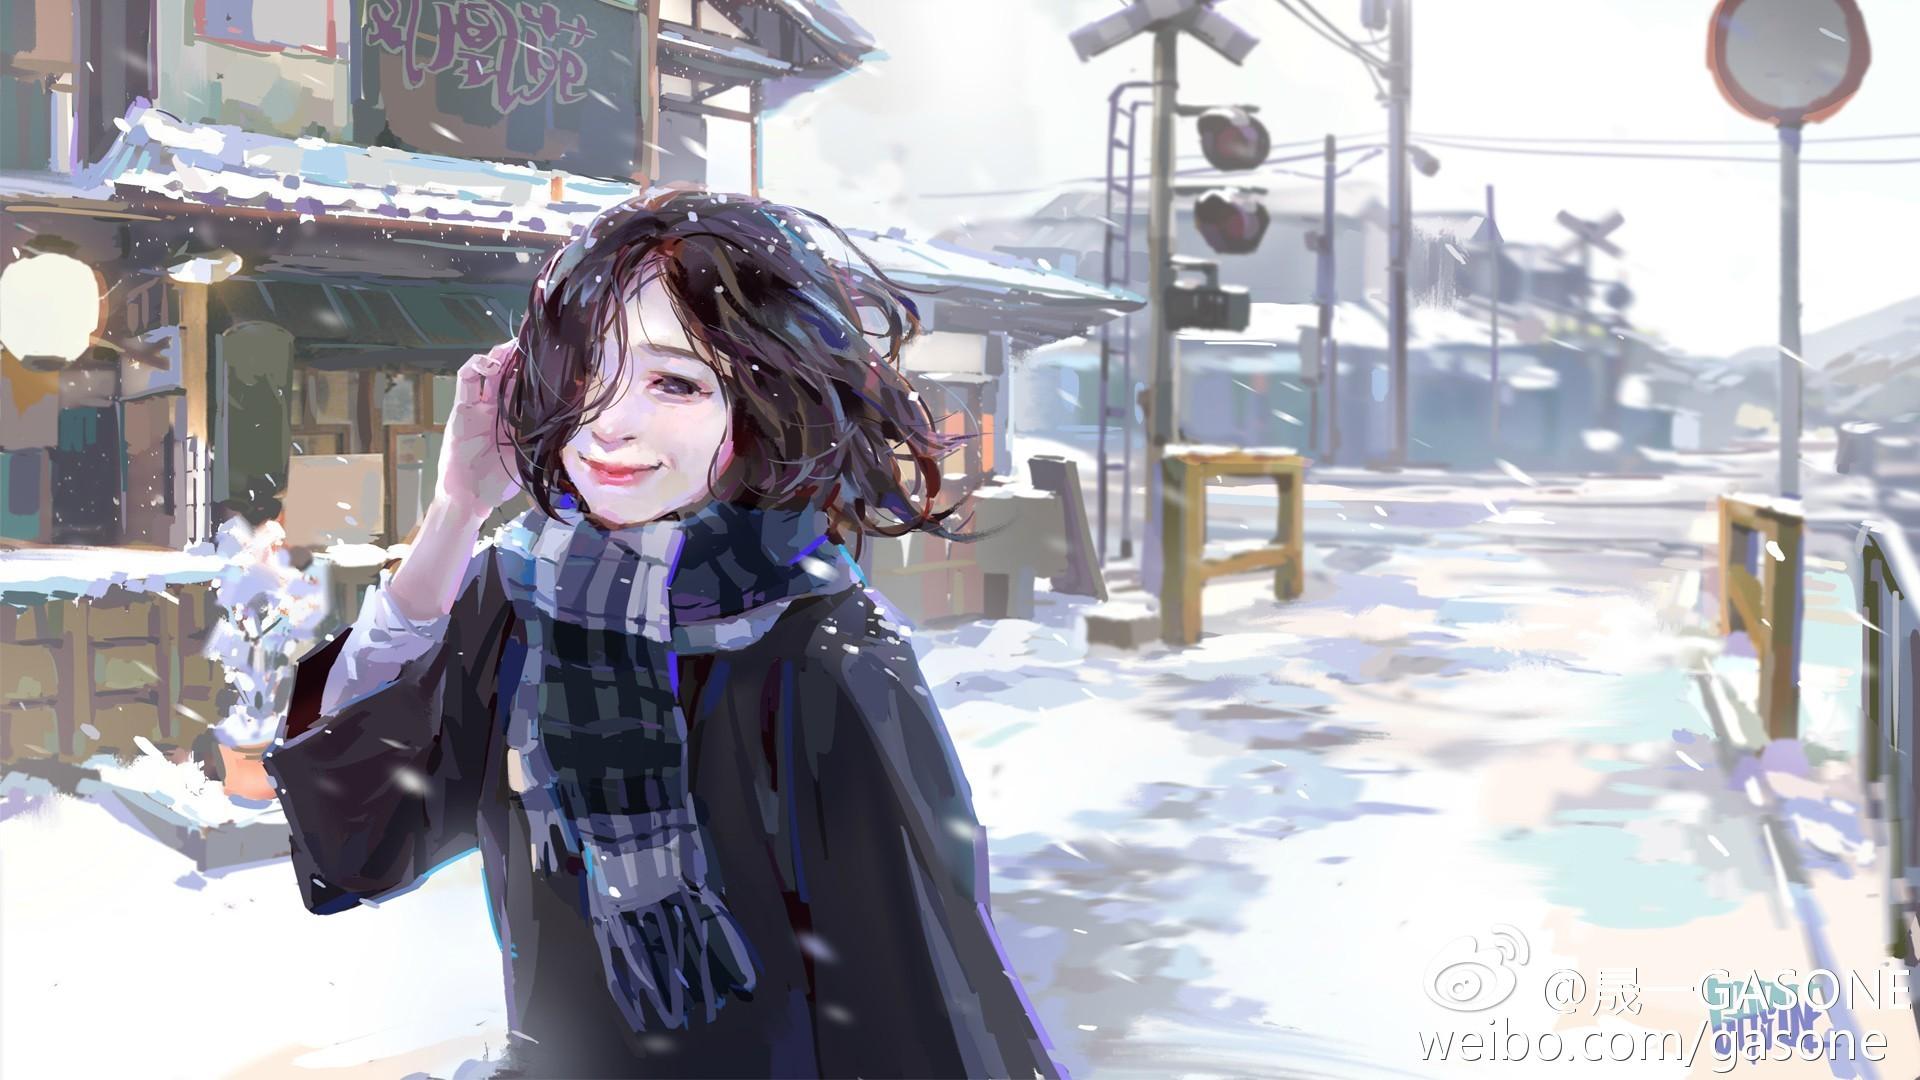 Shengyi sun 6eb59321gw1f8gf4ad9vmj21hc0u0124